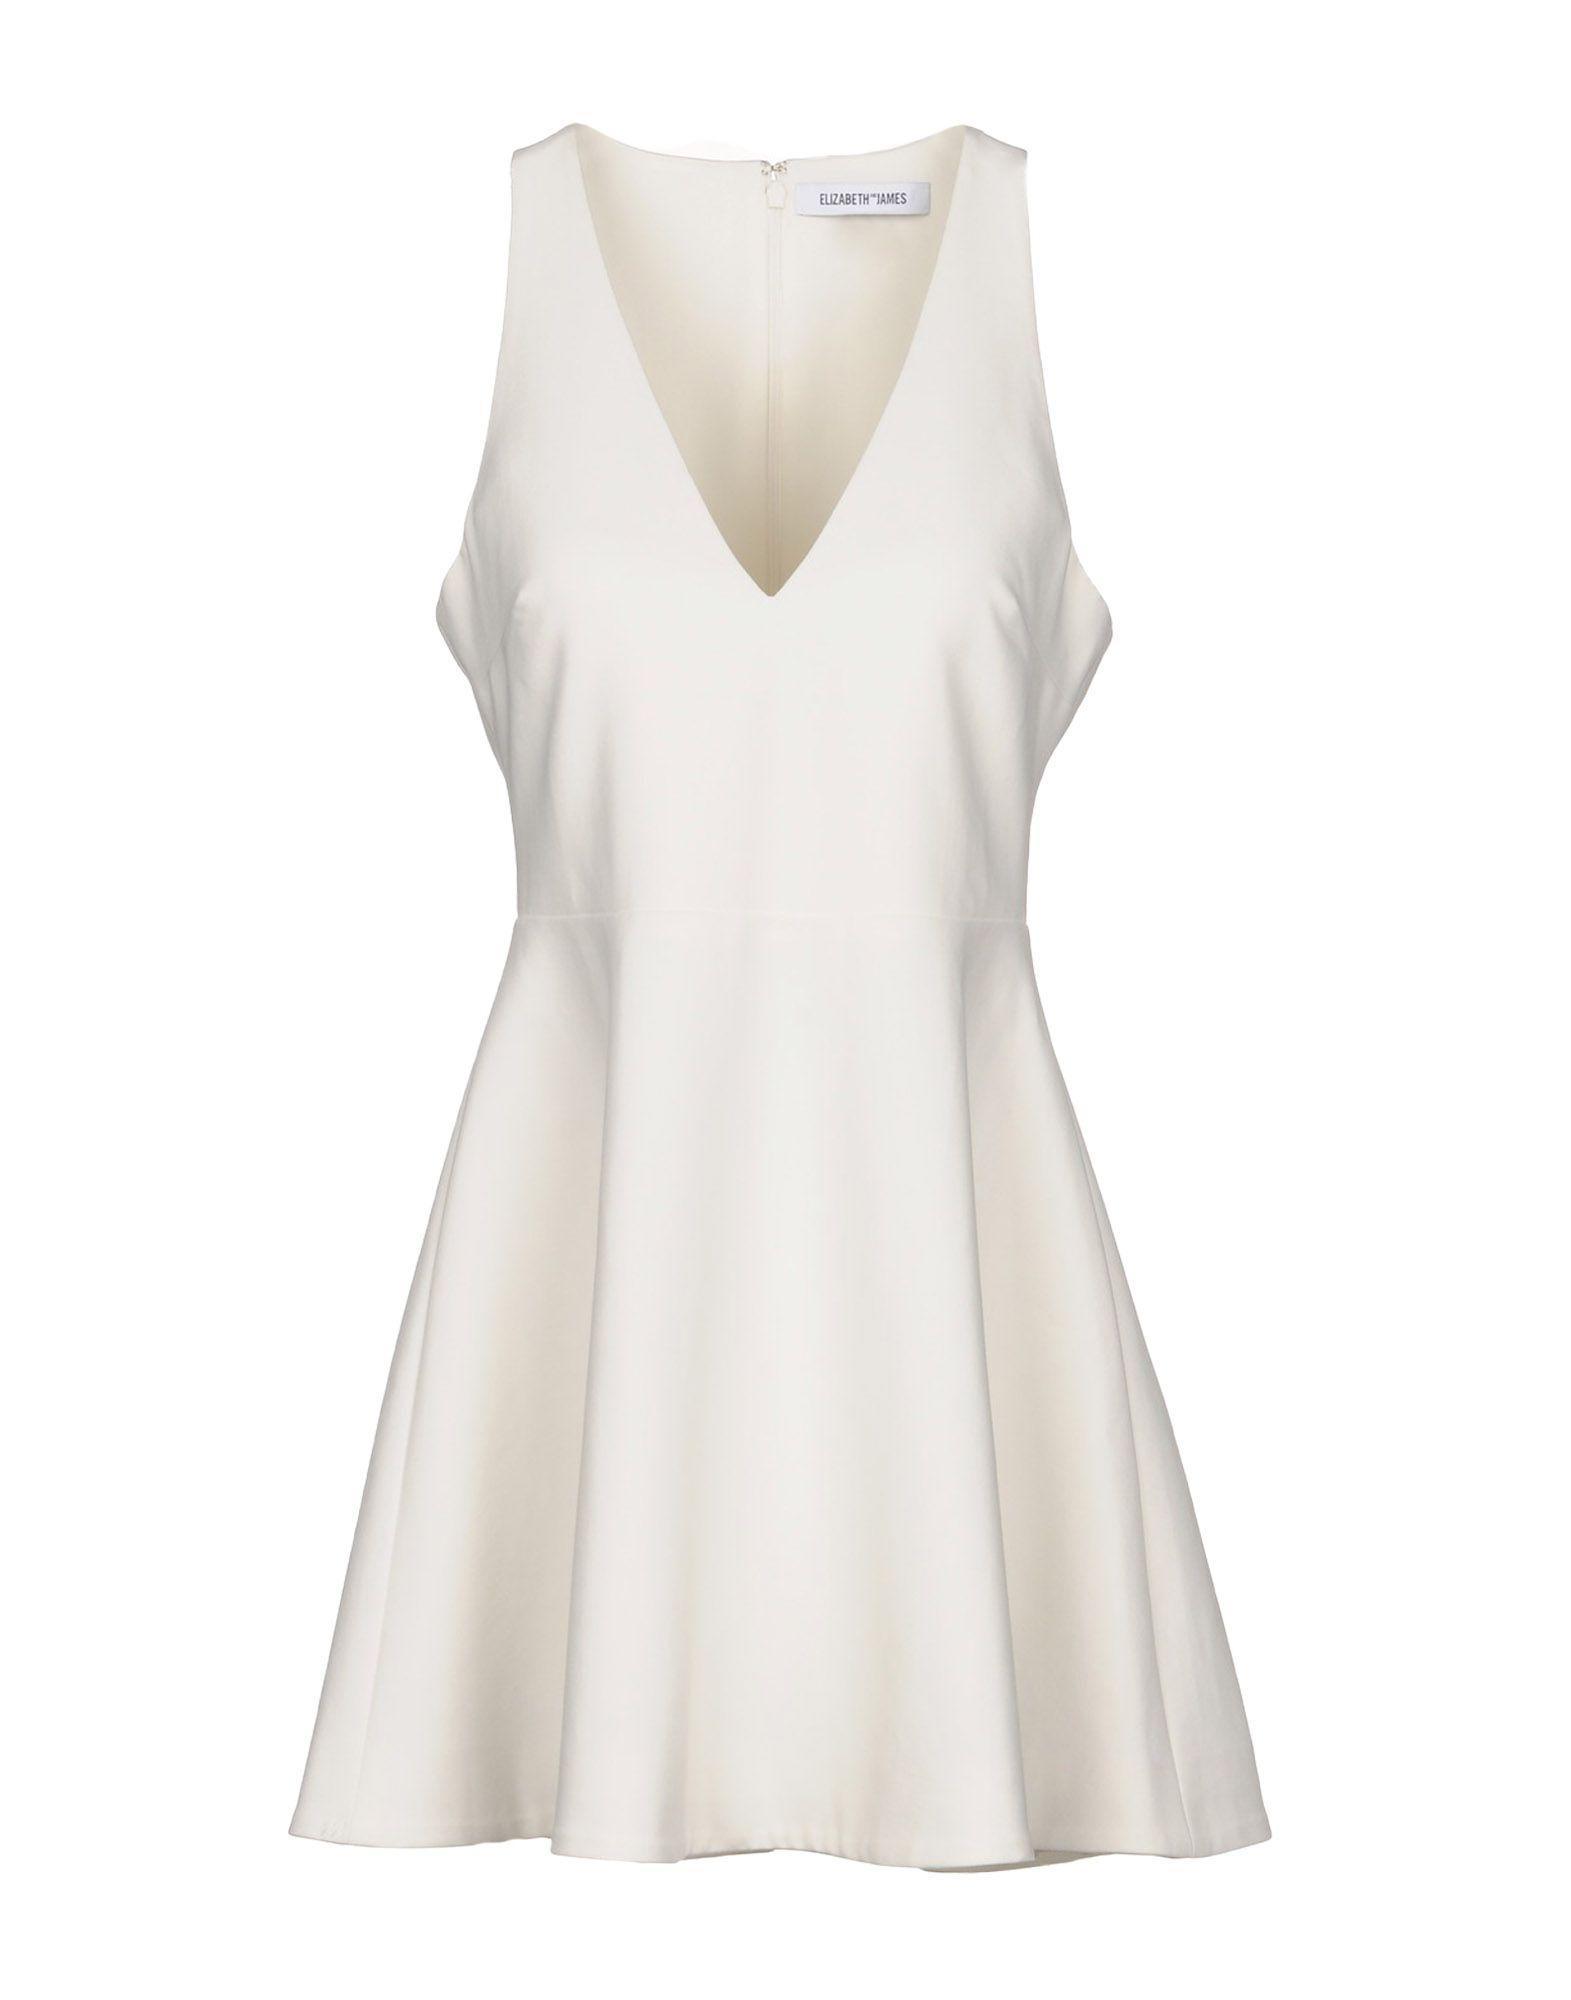 Elizabeth And James Short Dresses In White